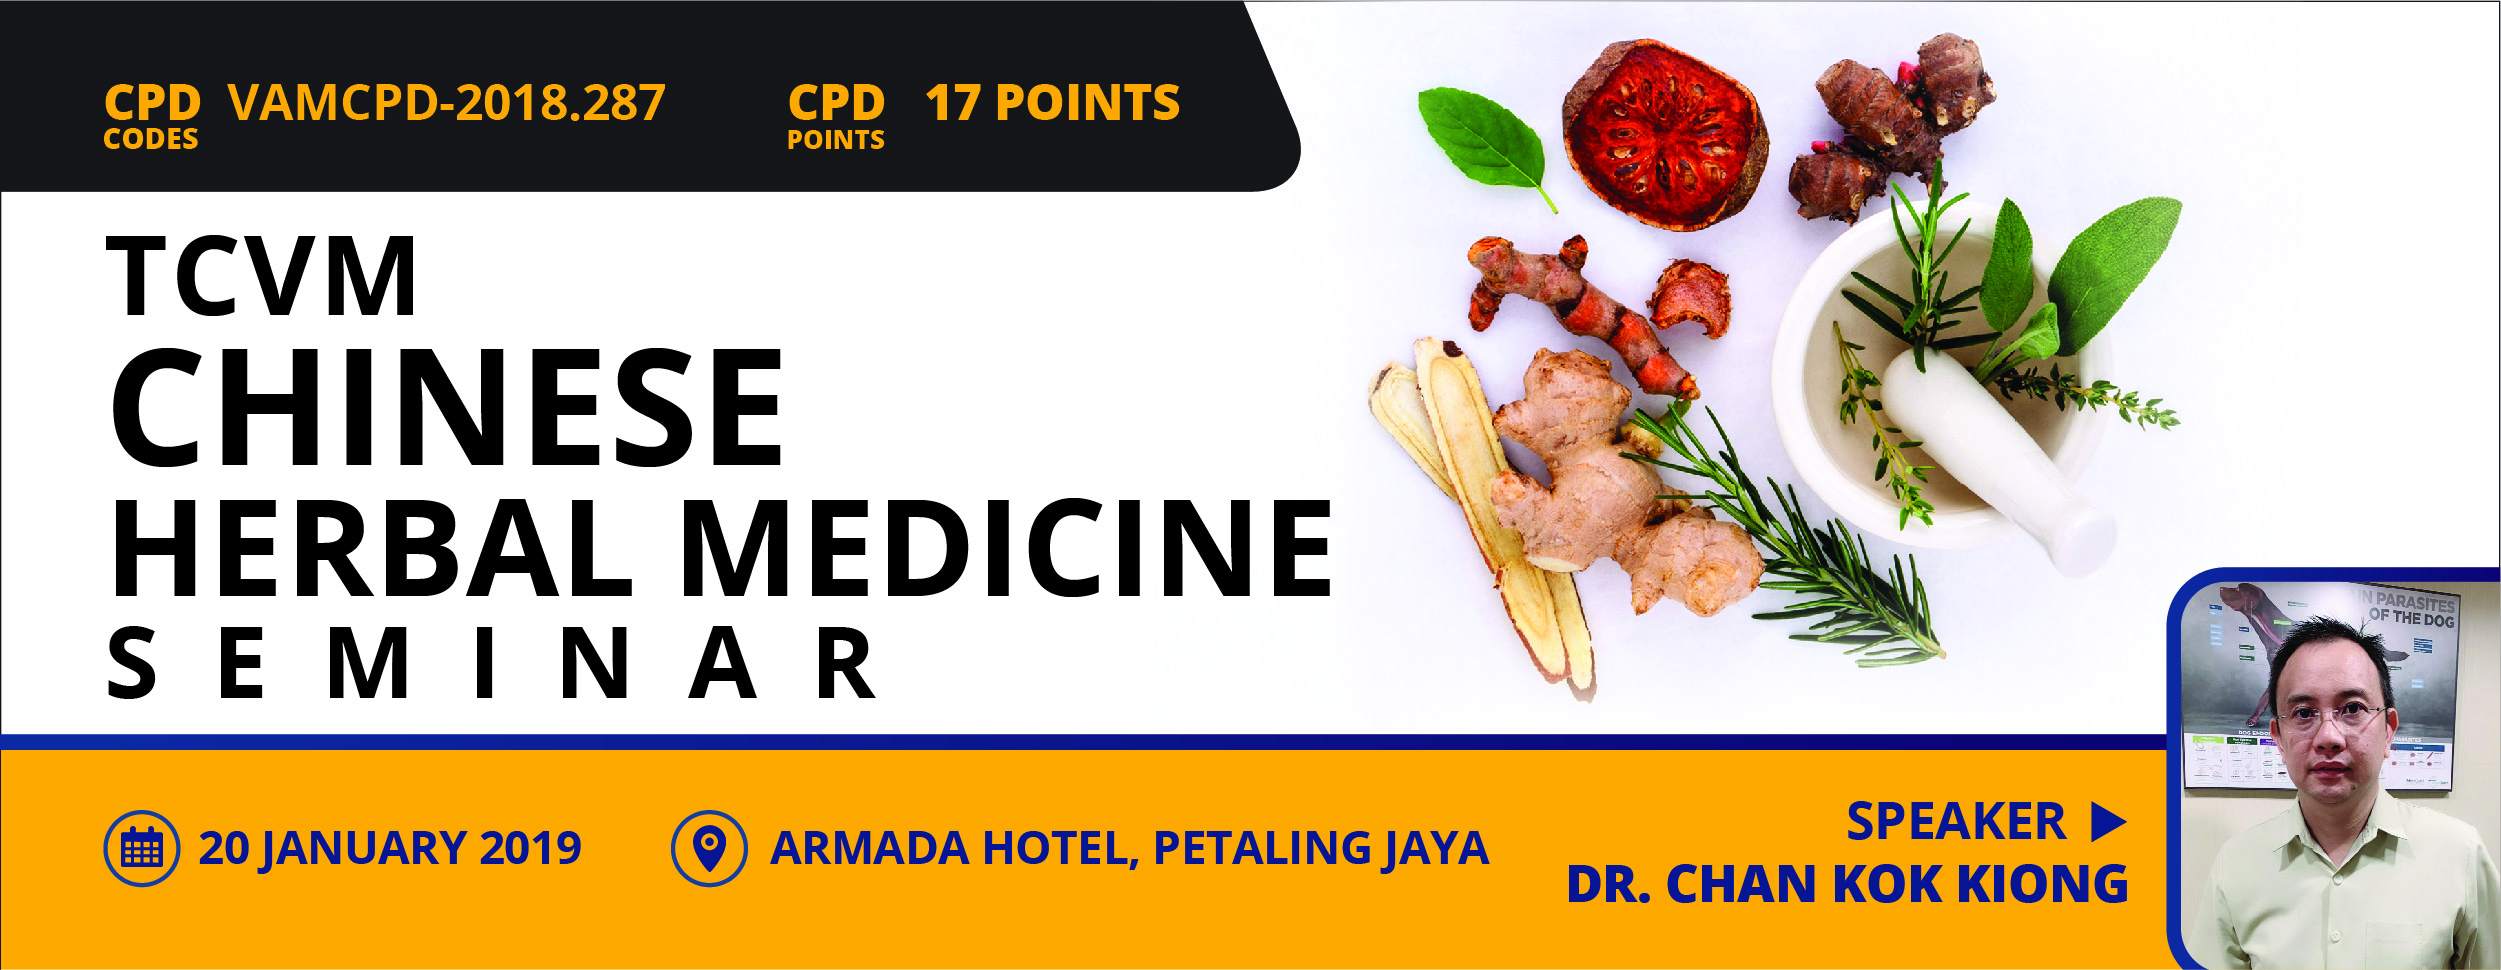 TCVM – Chinese Herbal Medicine Seminar